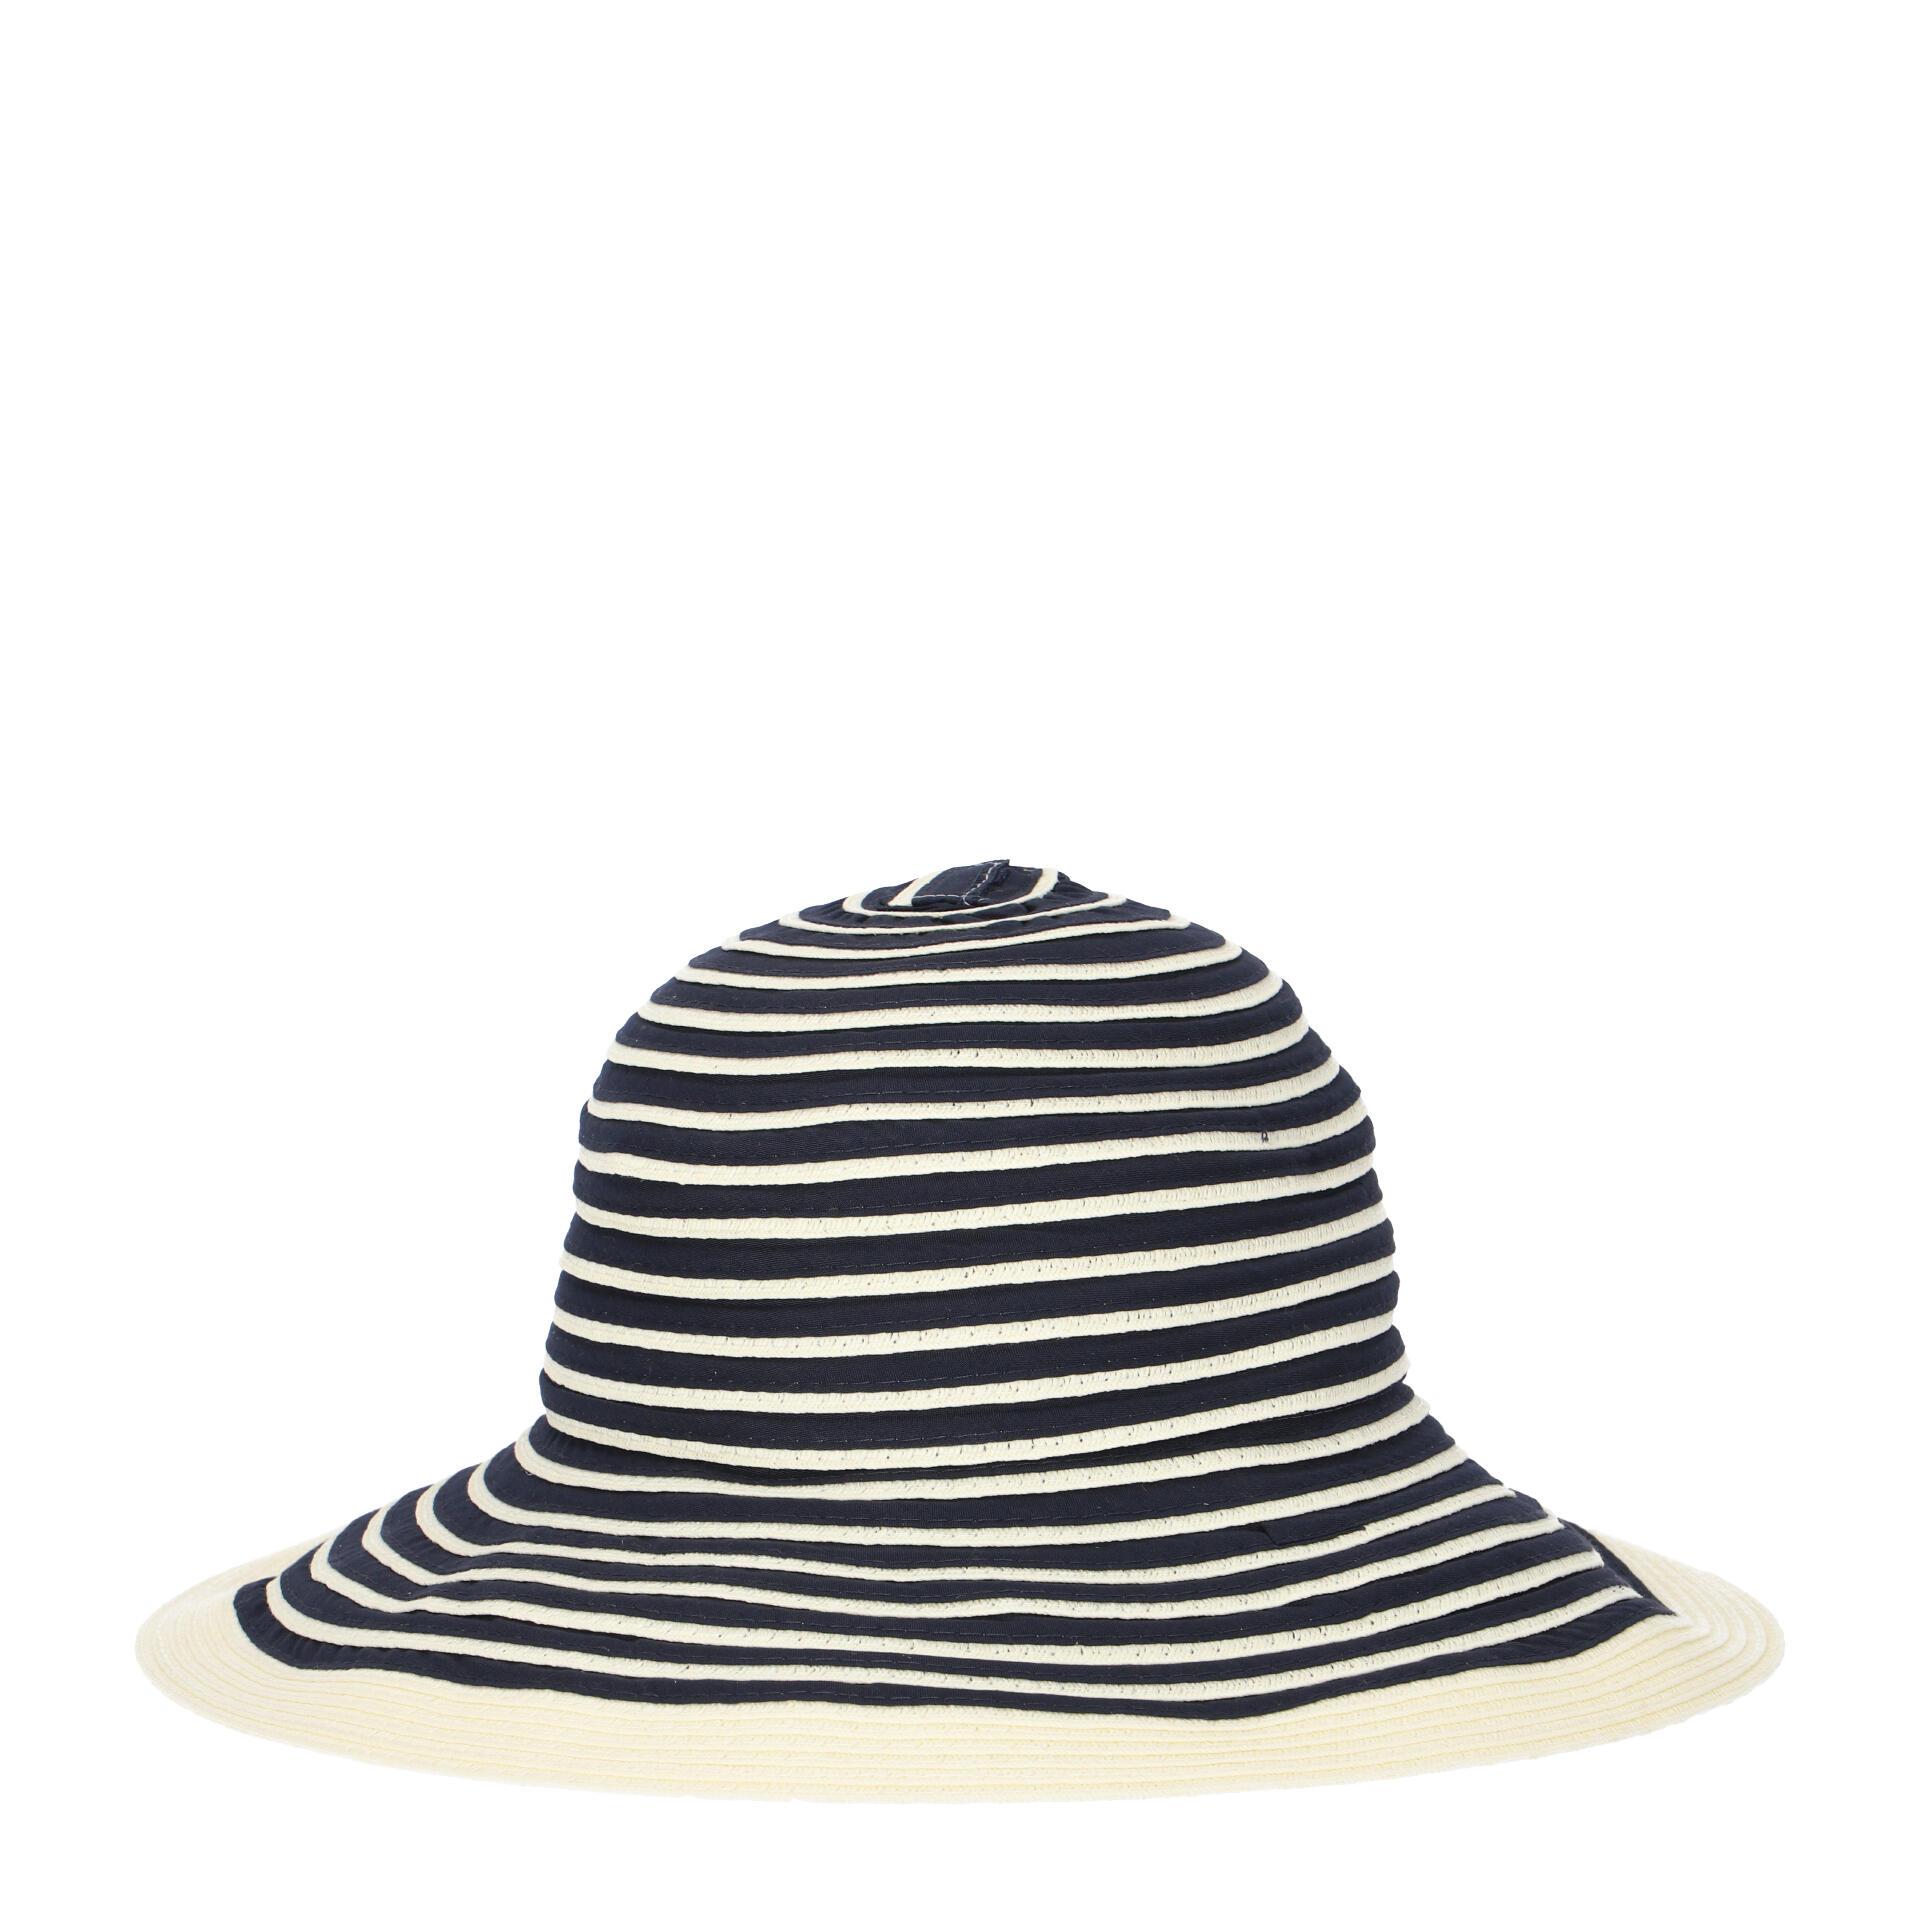 Sealand Sonnenhut navy stripe